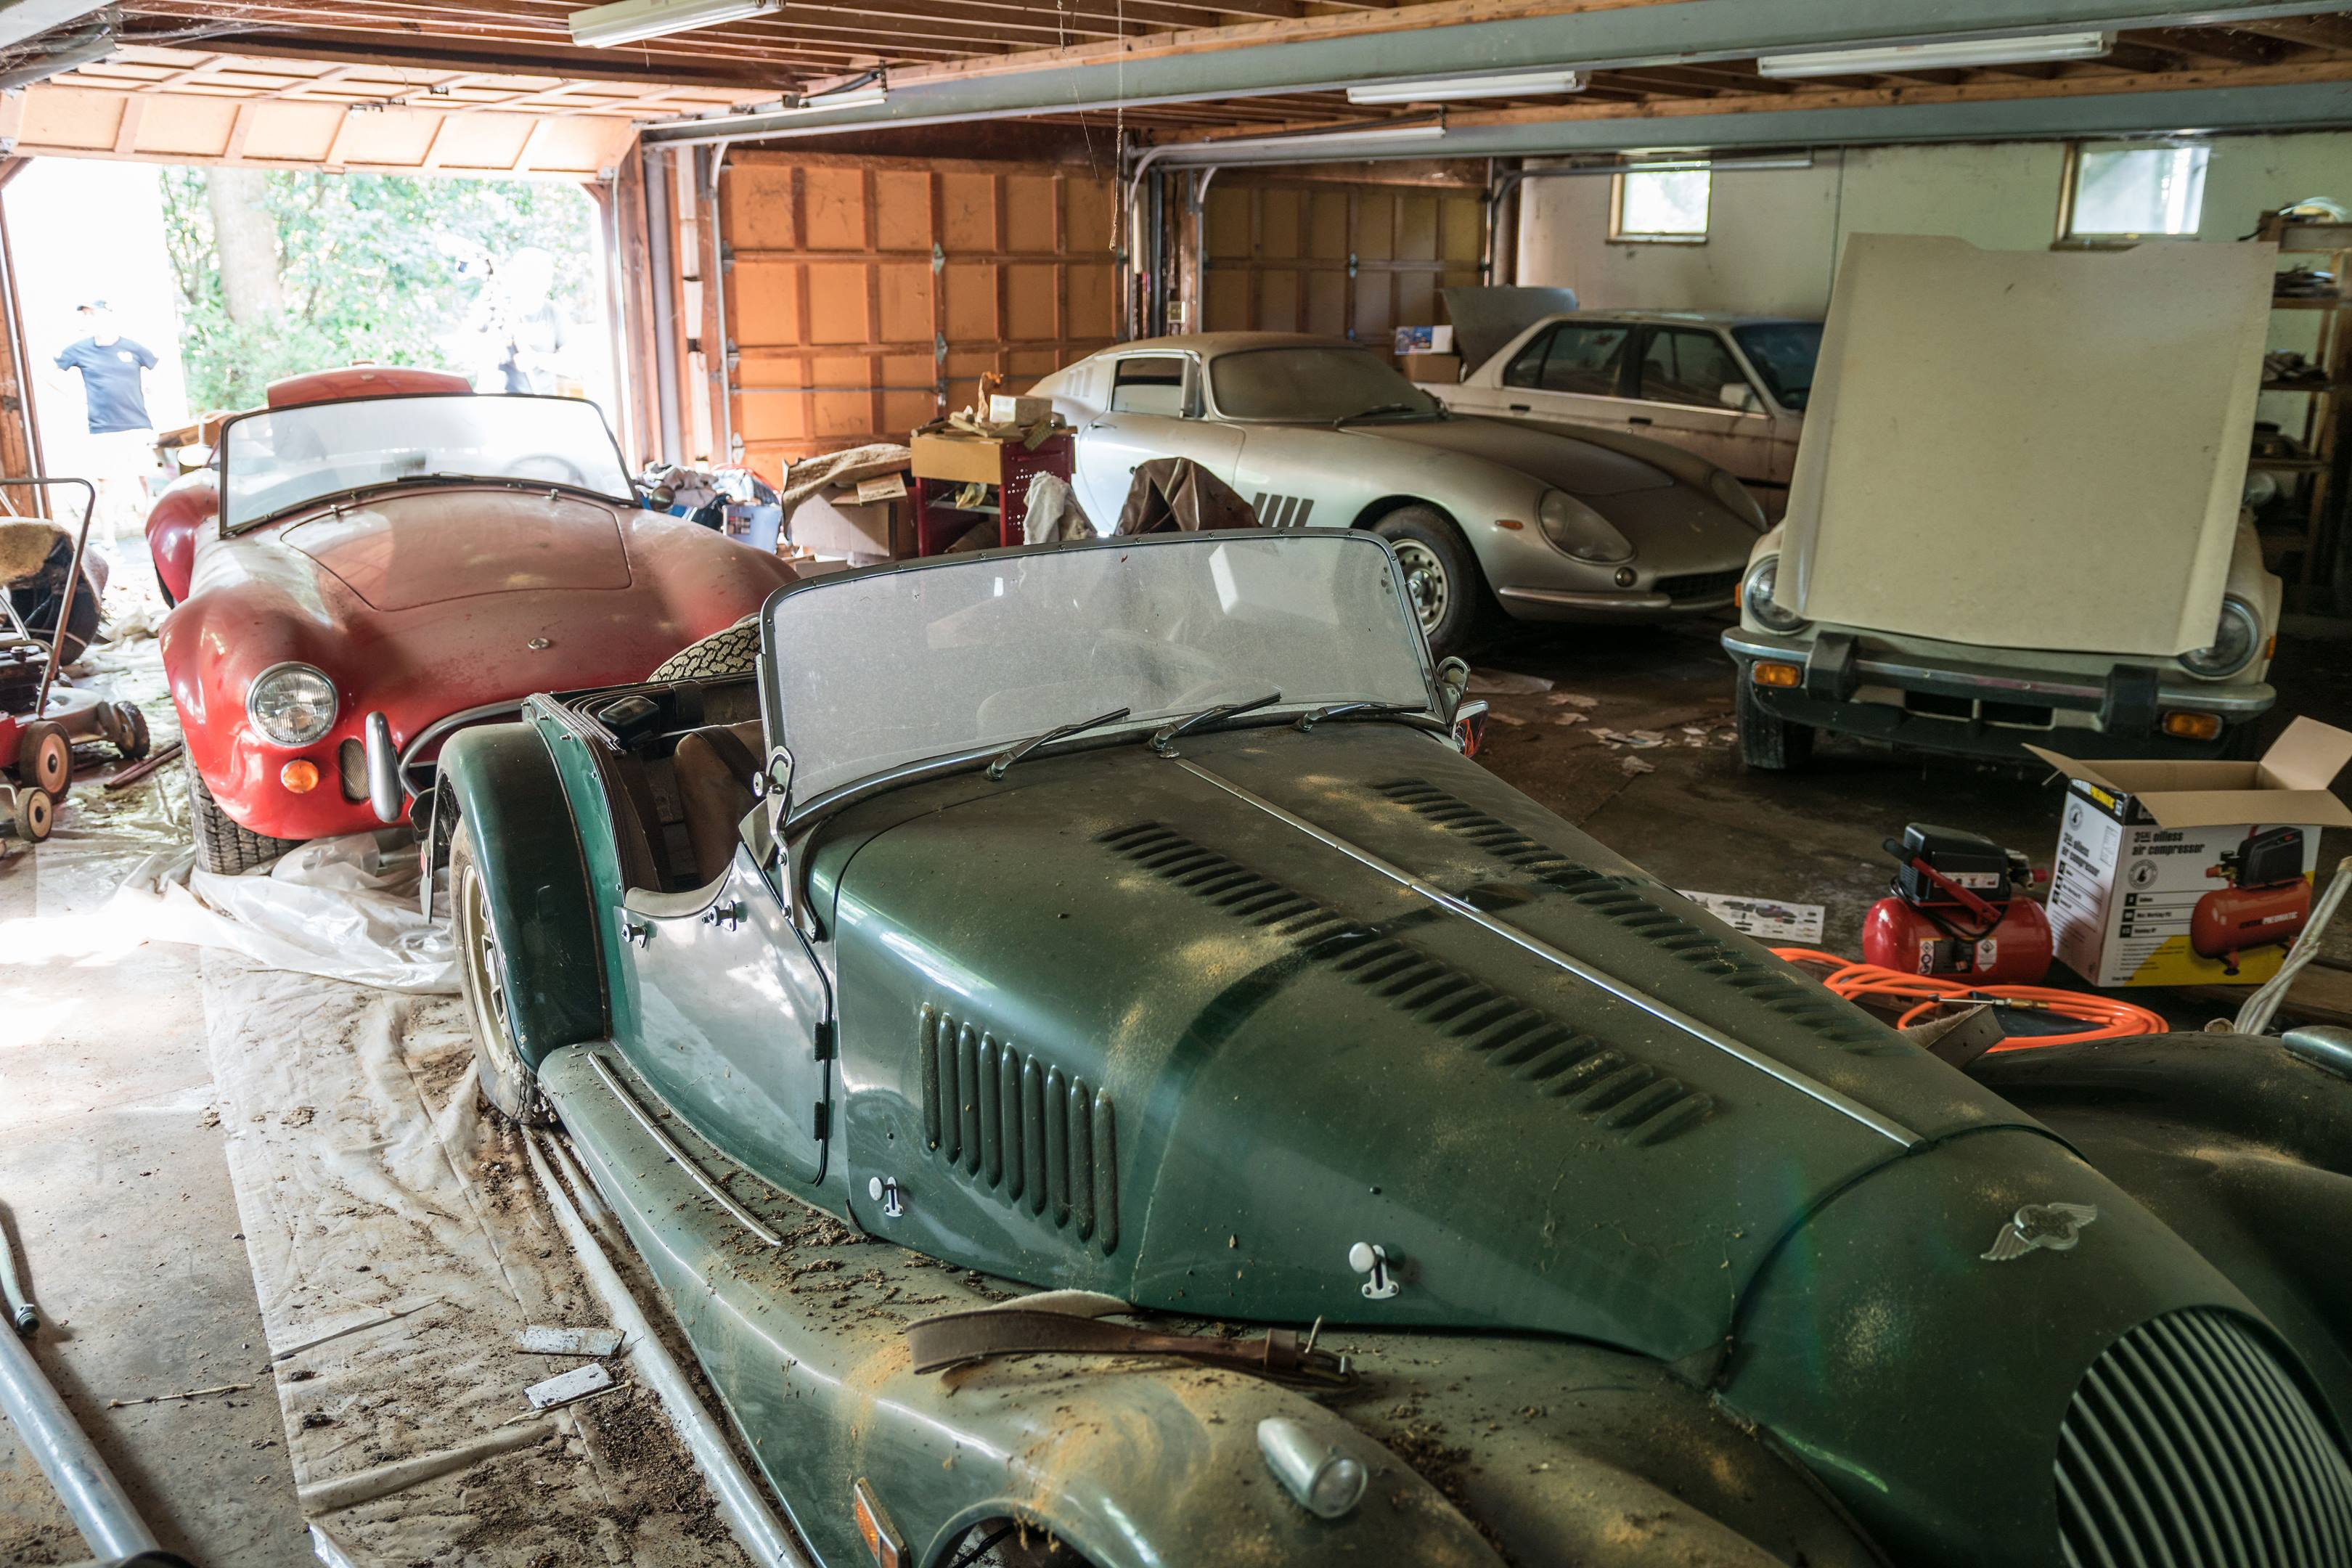 massive barn find found in NC, Ferrari 275 GTB/2 Alloy, 427 Shelby Cobra